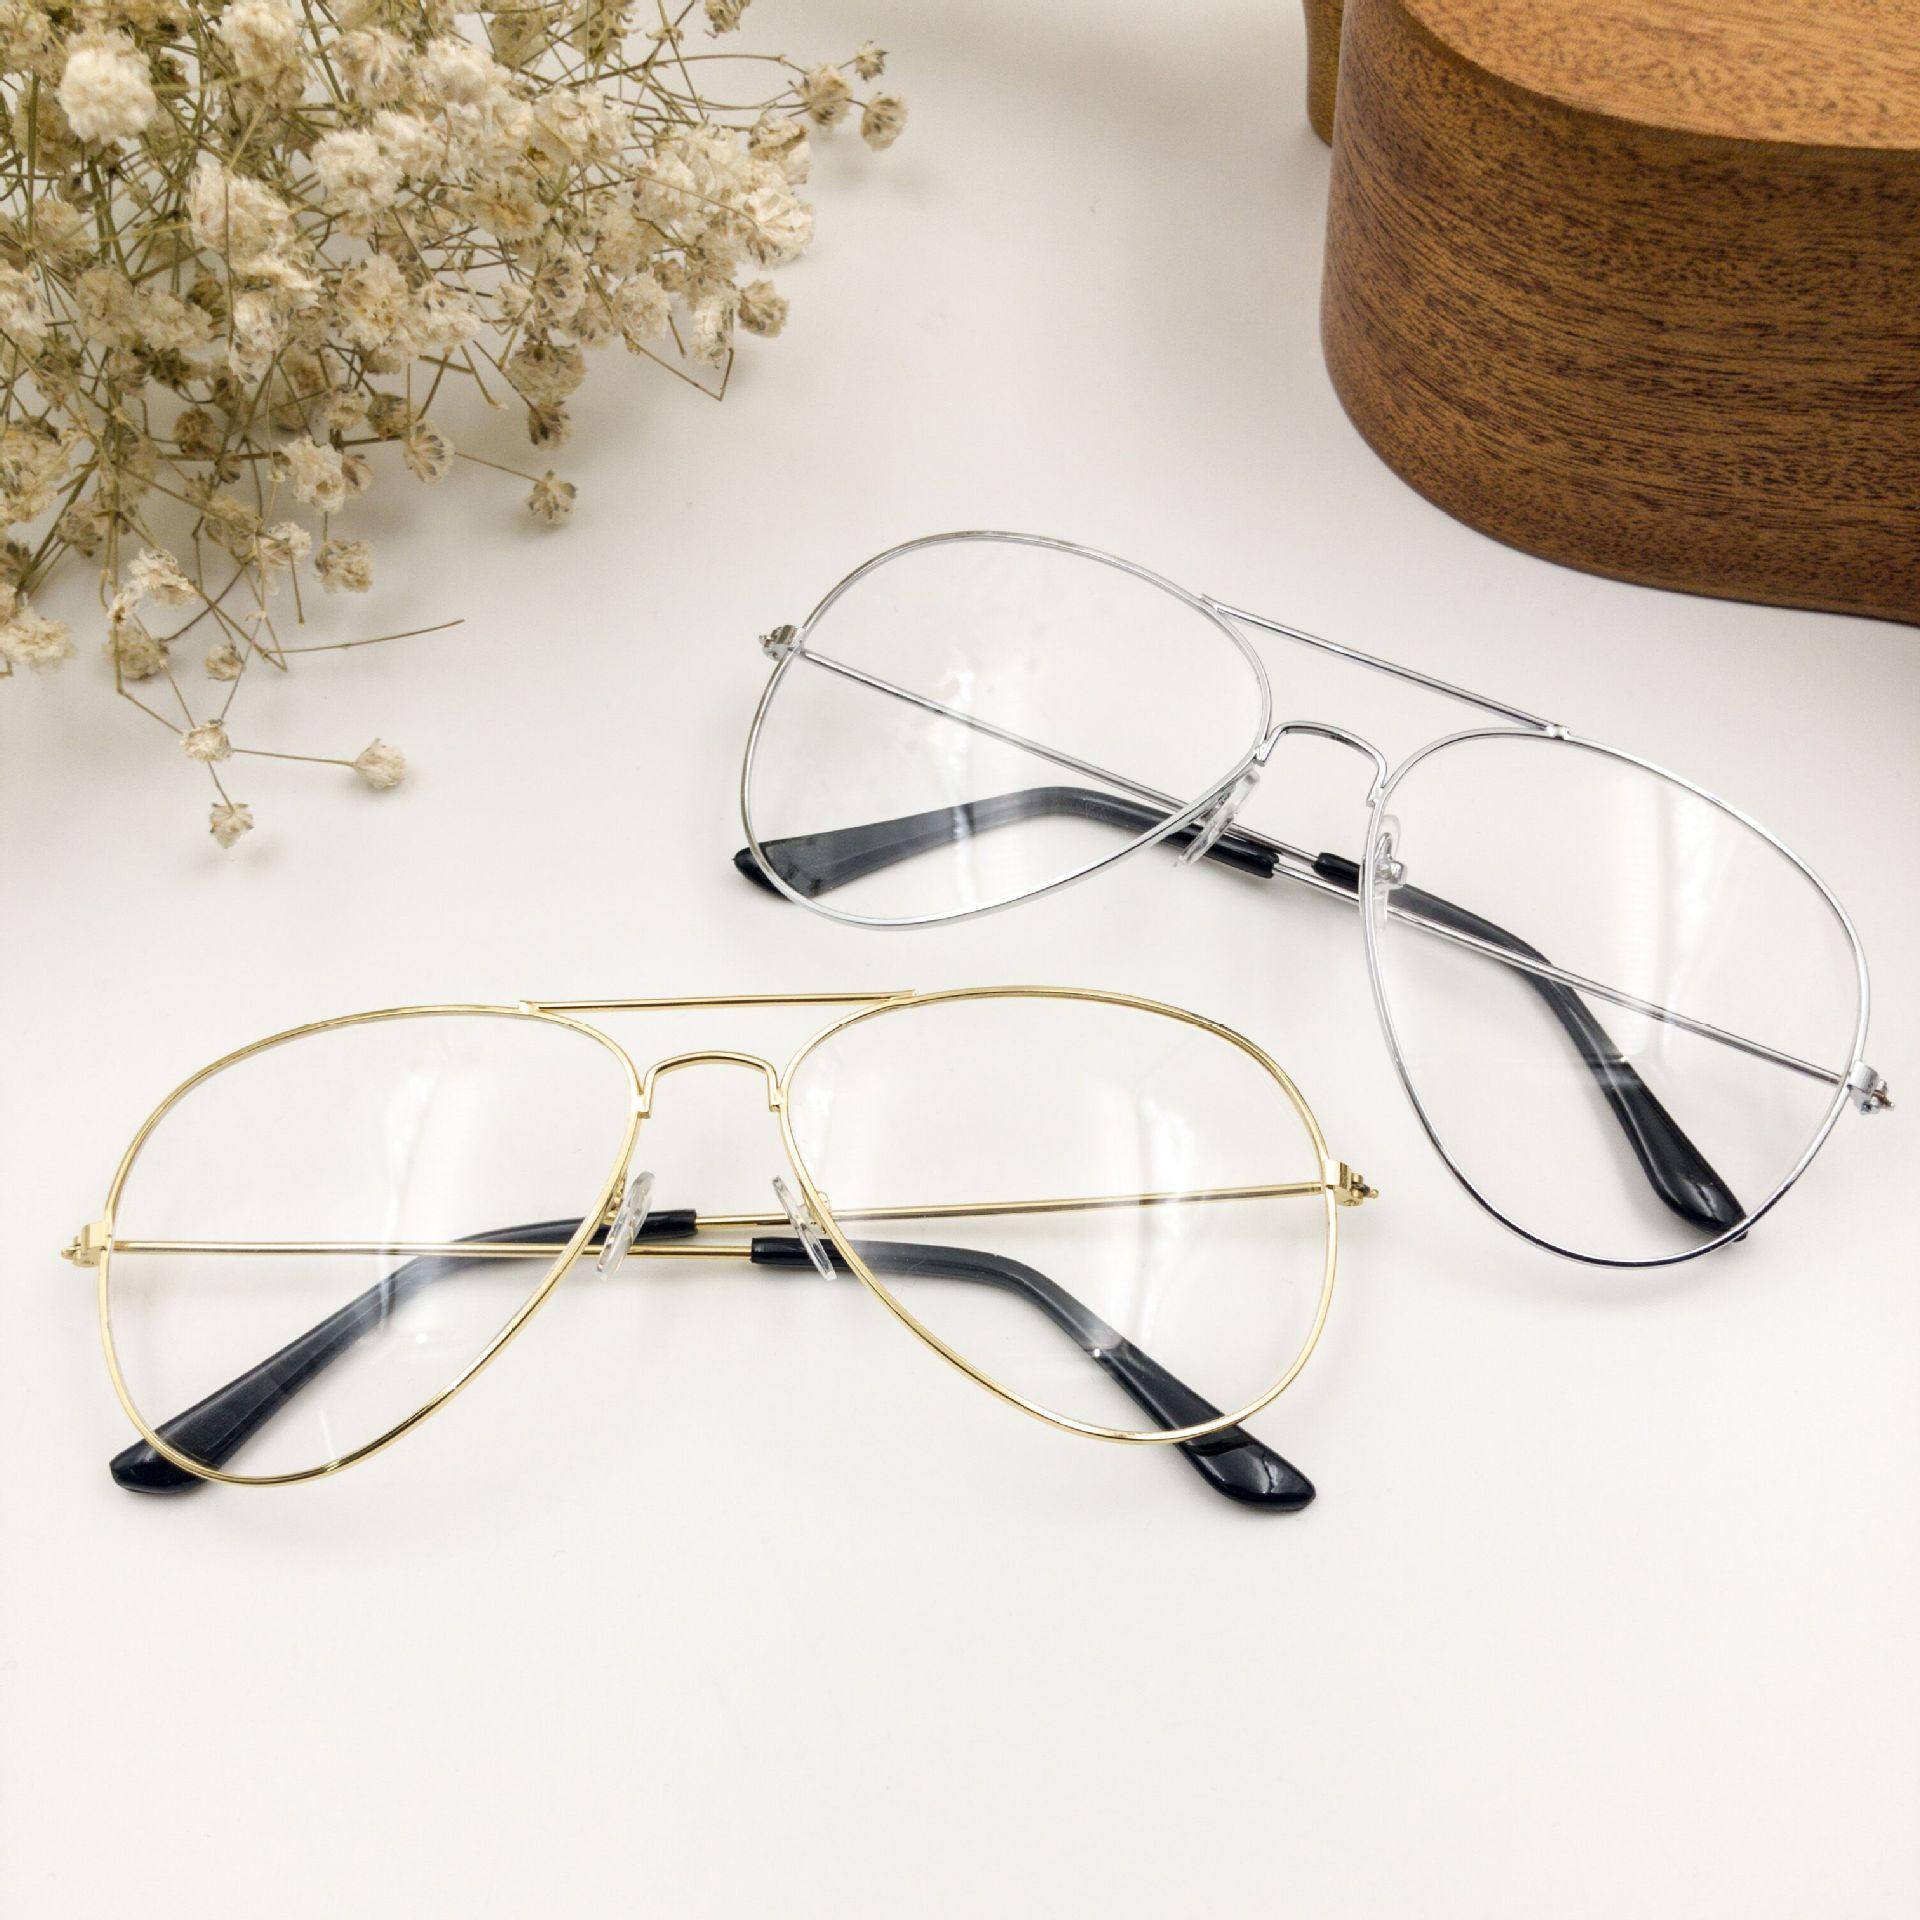 Frame Aviator Sunglasses Trend Plain